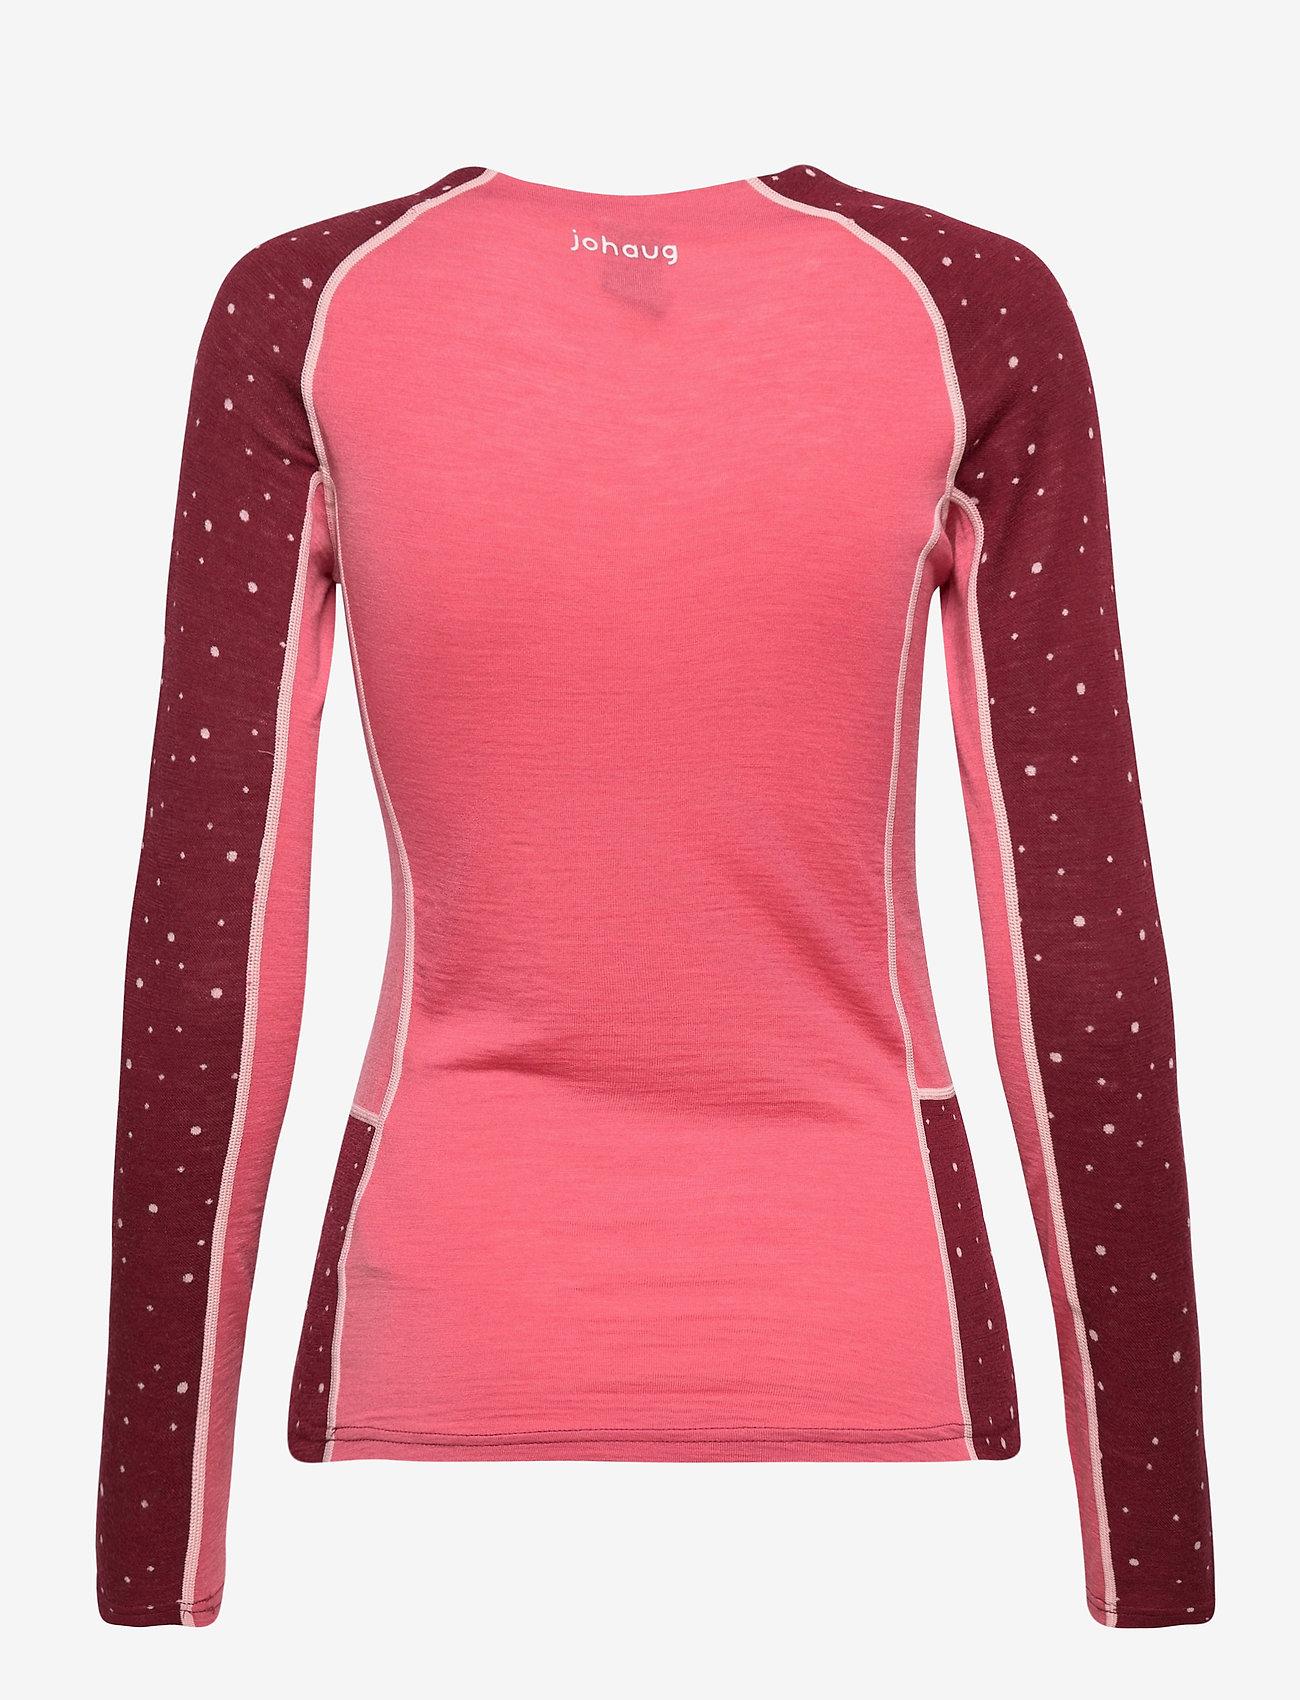 Johaug - Maven Wool Long Sleeve - base layer tops - caber - 1